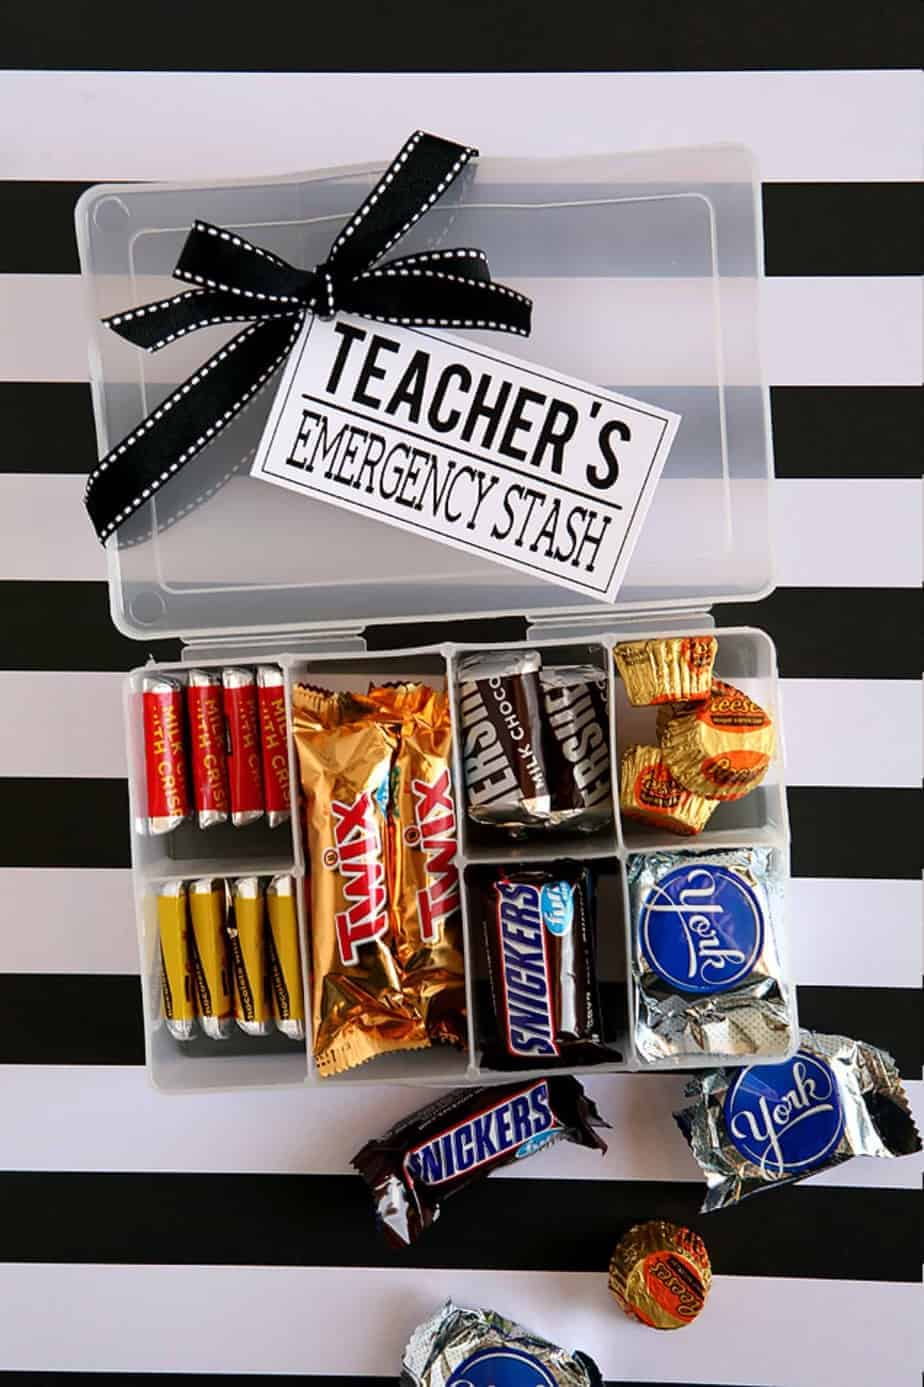 teacher emergency stash gift idea